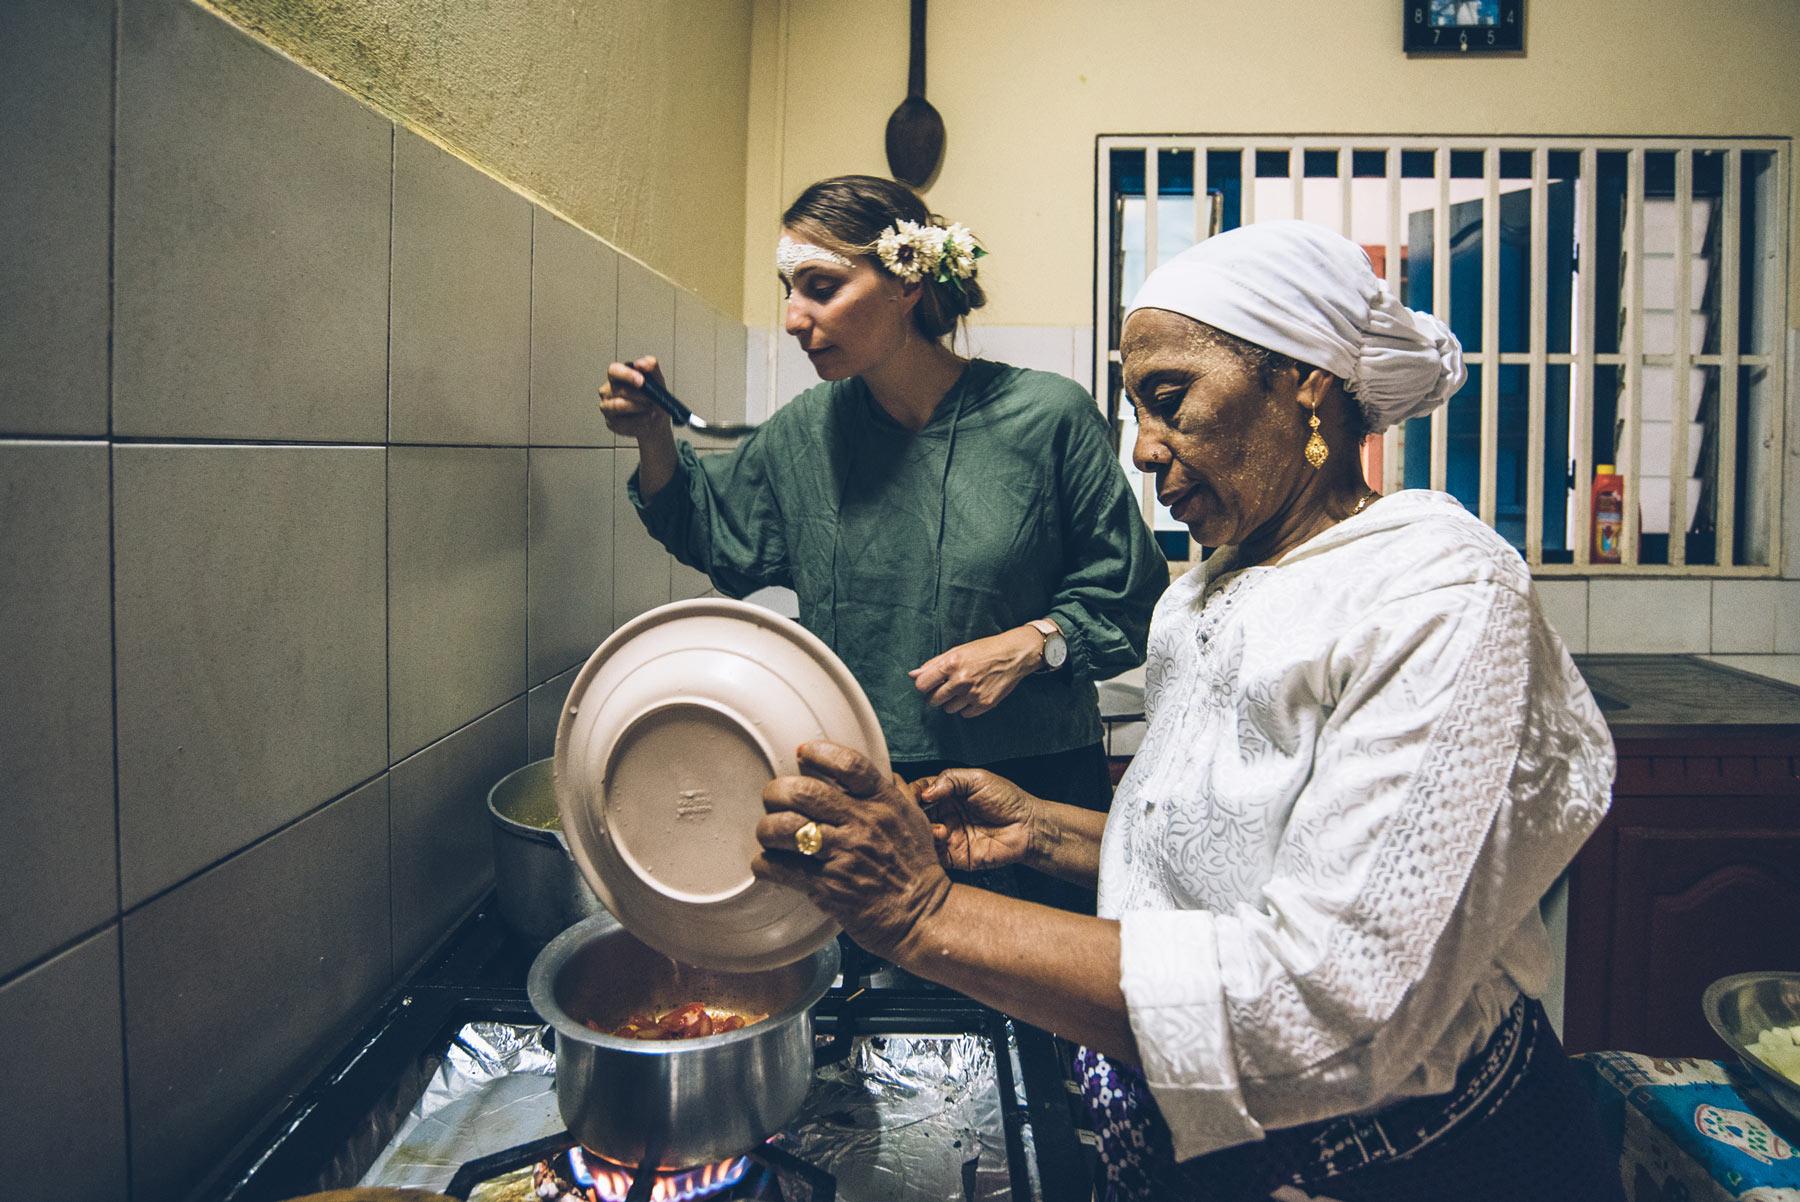 Cours de cuisine mahoraise avec Taambati, Mayotte